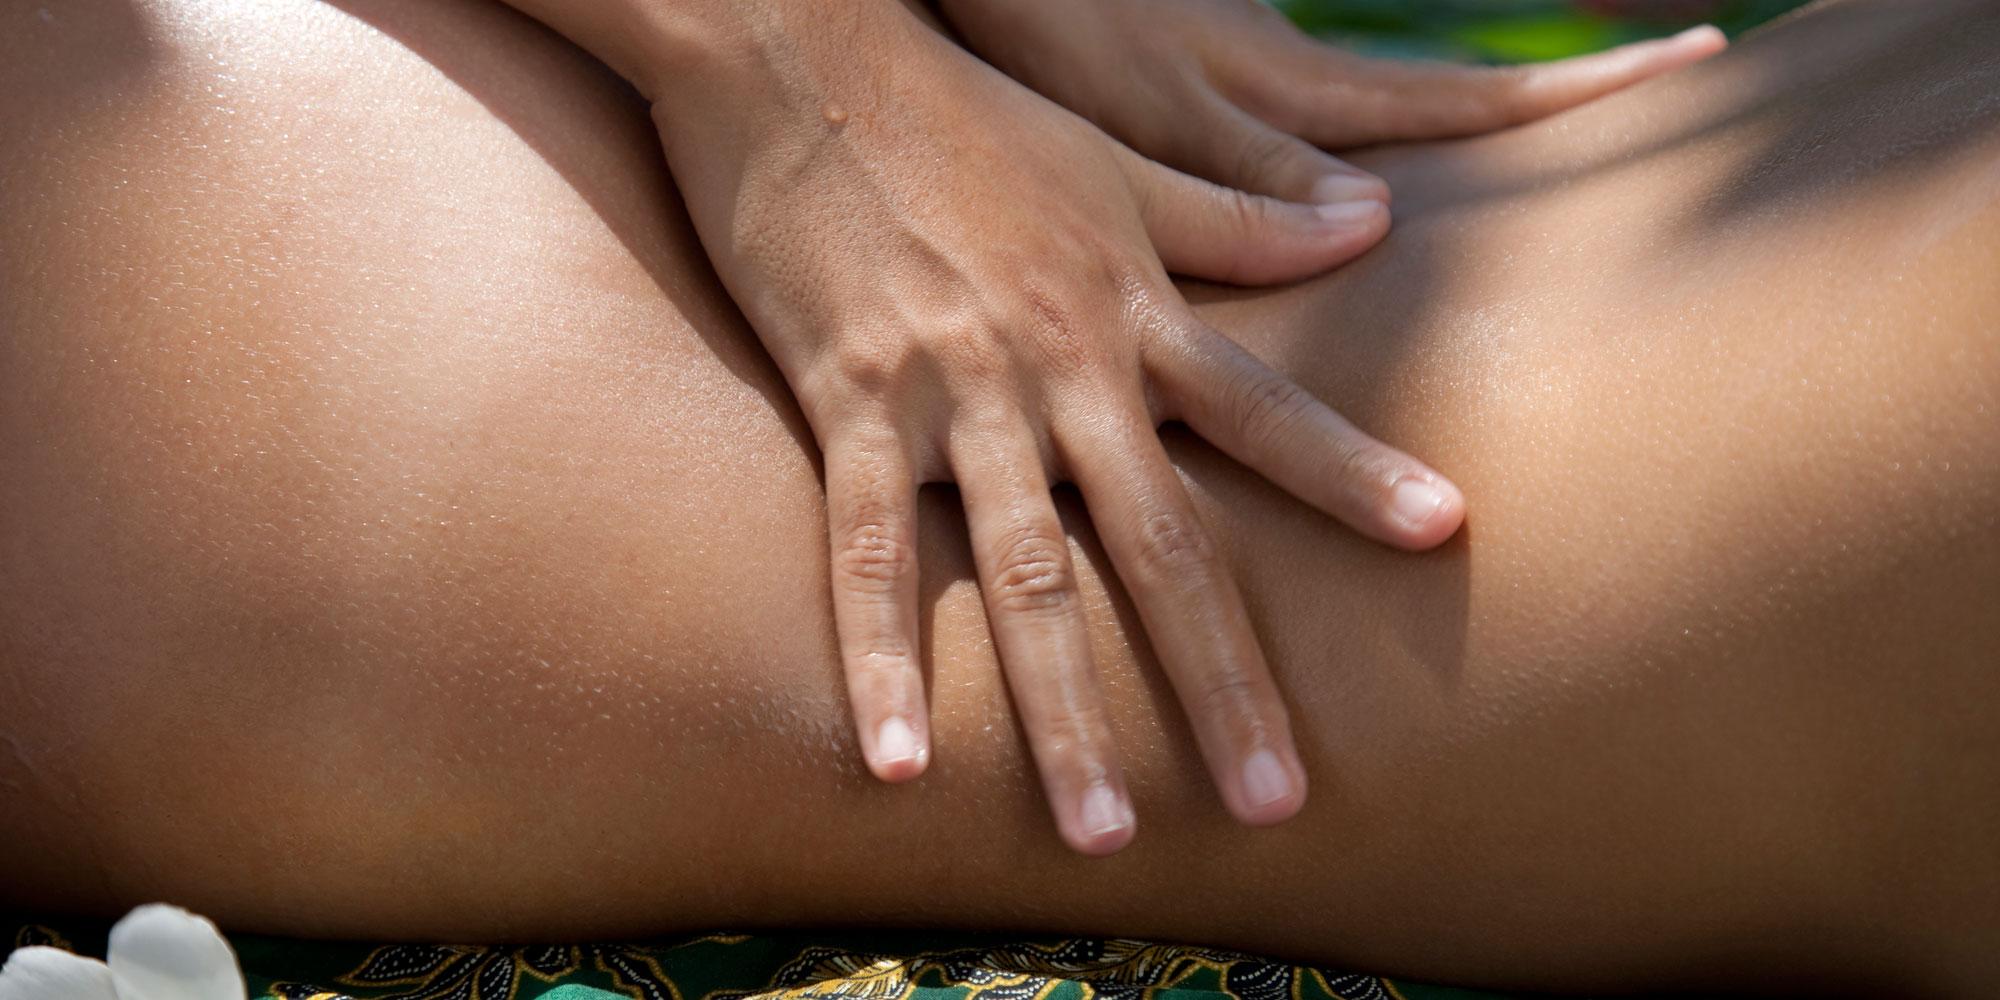 professional erotic massage sex i